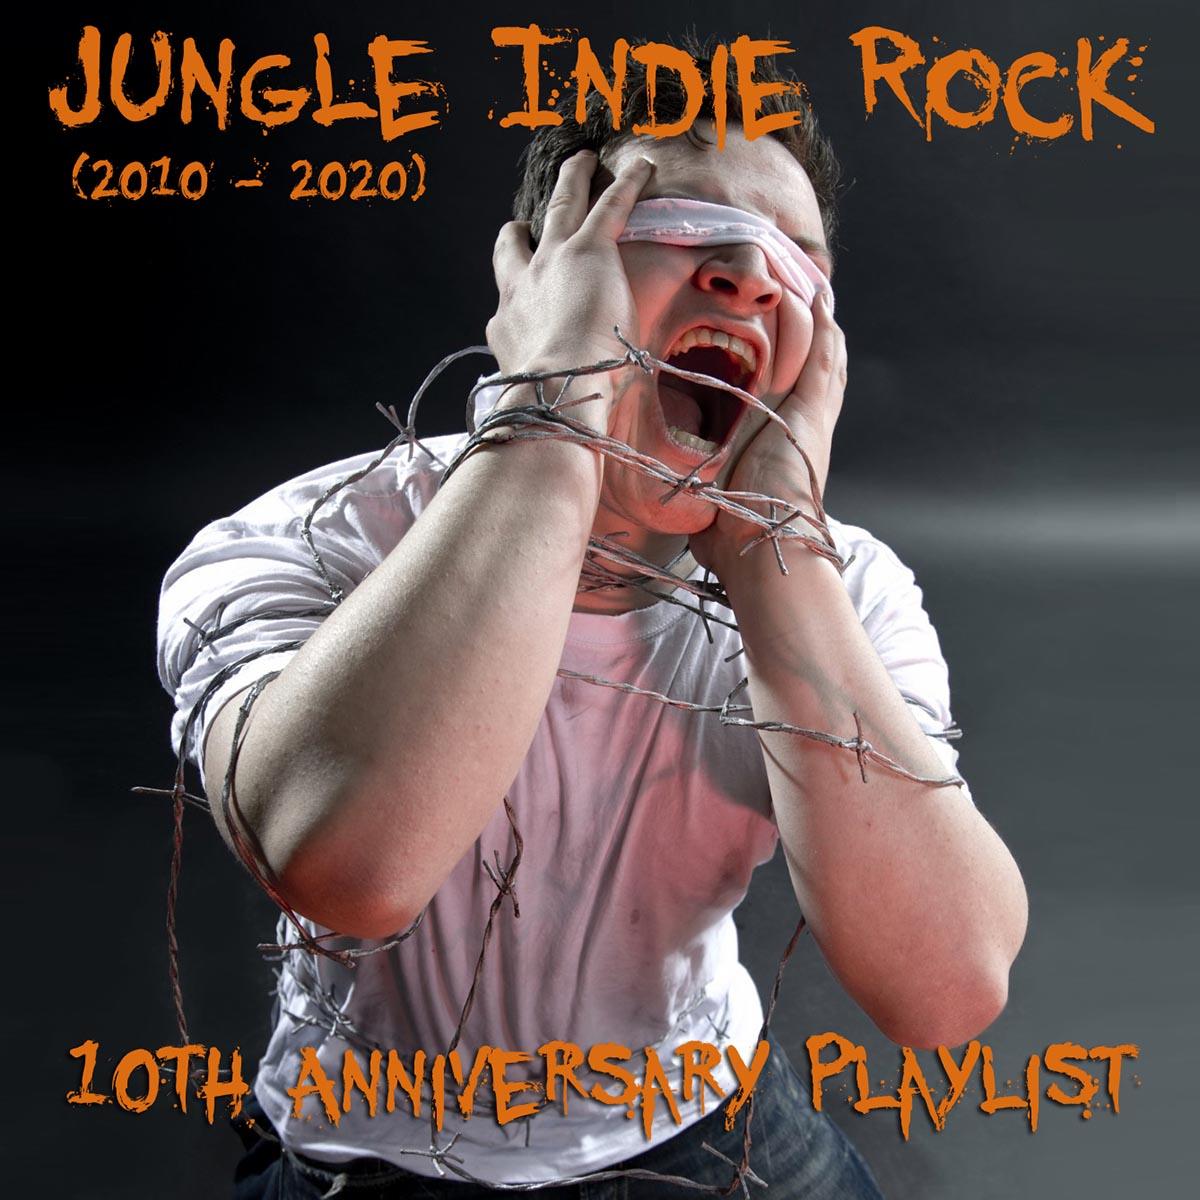 Jungle Indie Rock Music 10th Anniversary Playlist